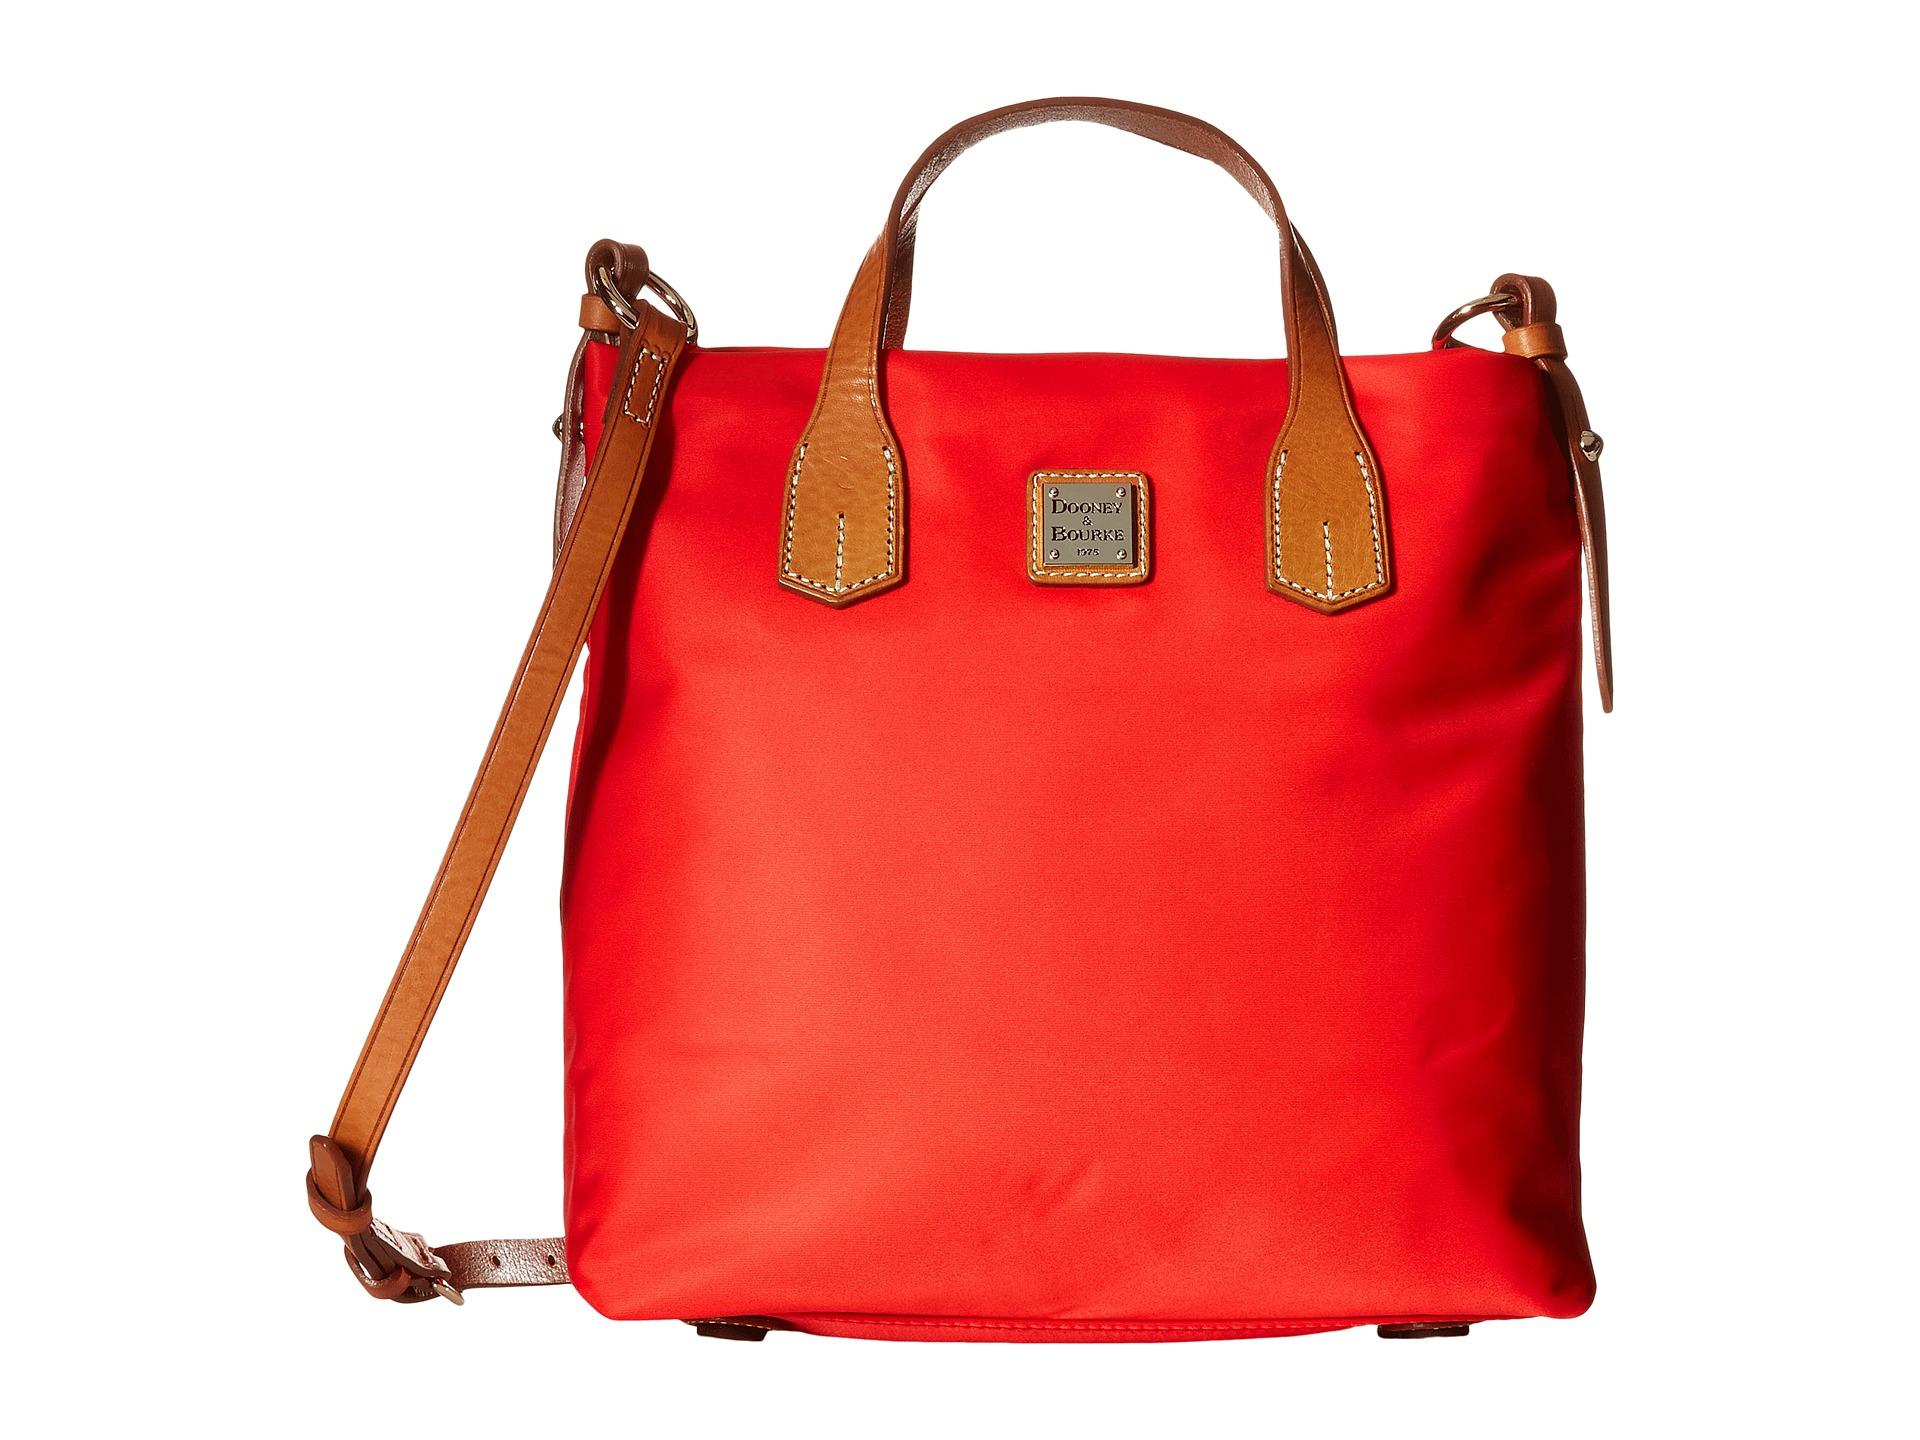 Dooney Burke Handbags Handbag Foto Famous Altiliburda Com